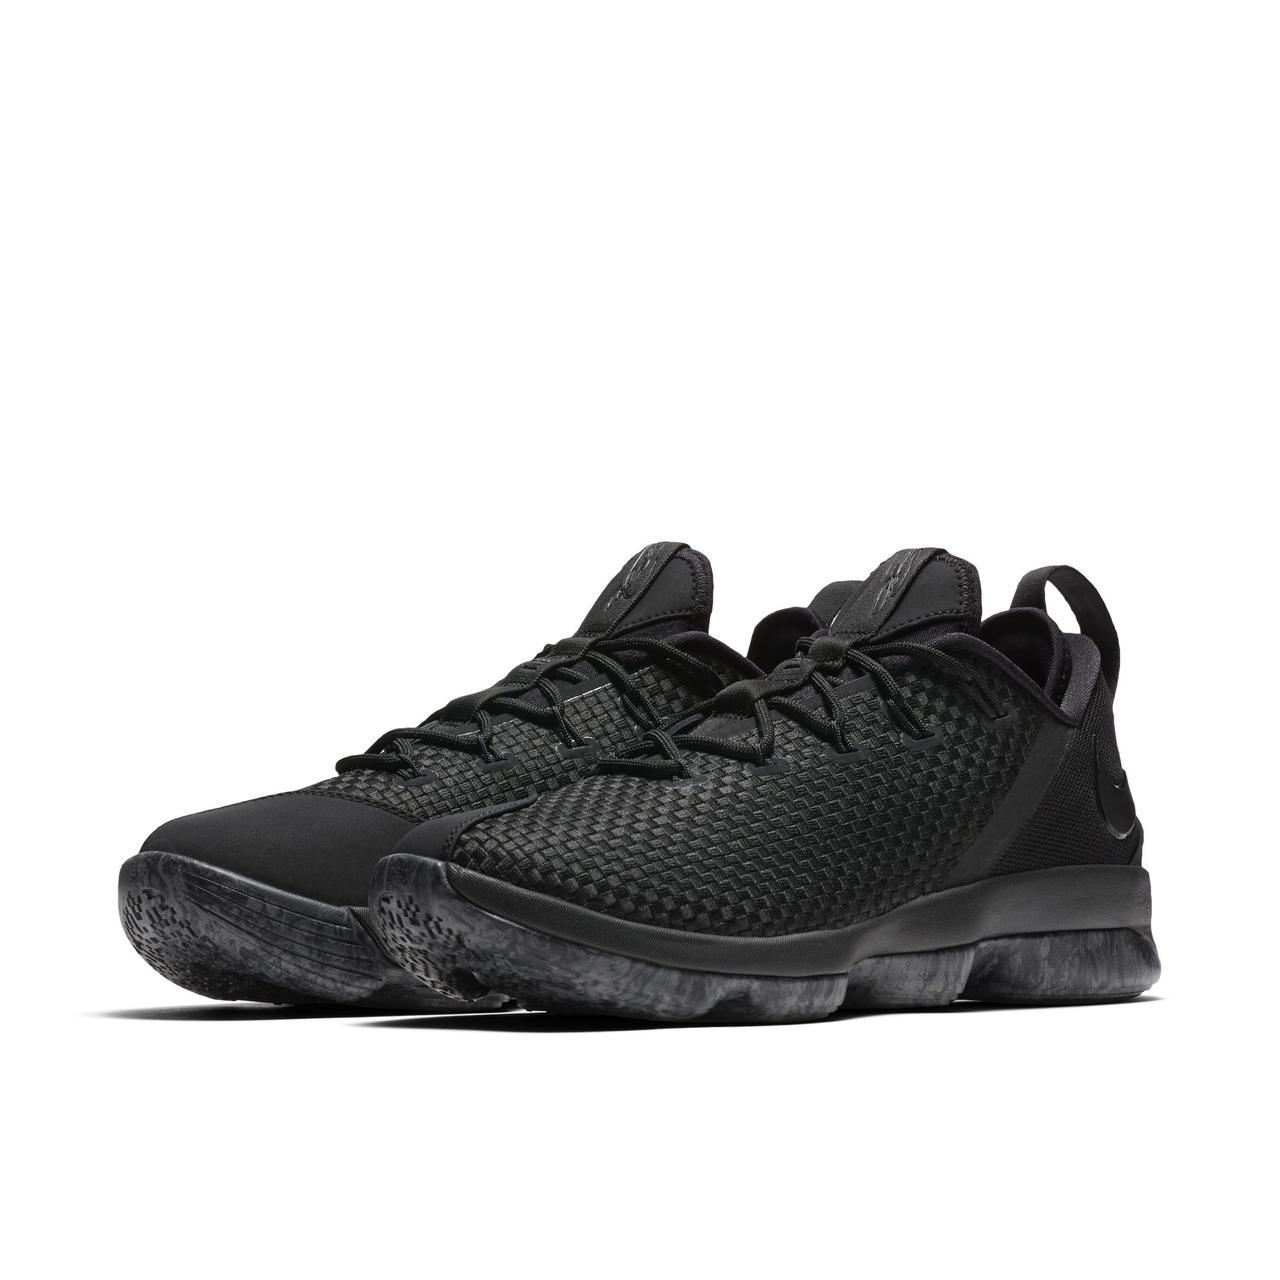 0594546c0966 Кроссовки баскетбольные Nike Lebron 14 Low Triple Black 878635